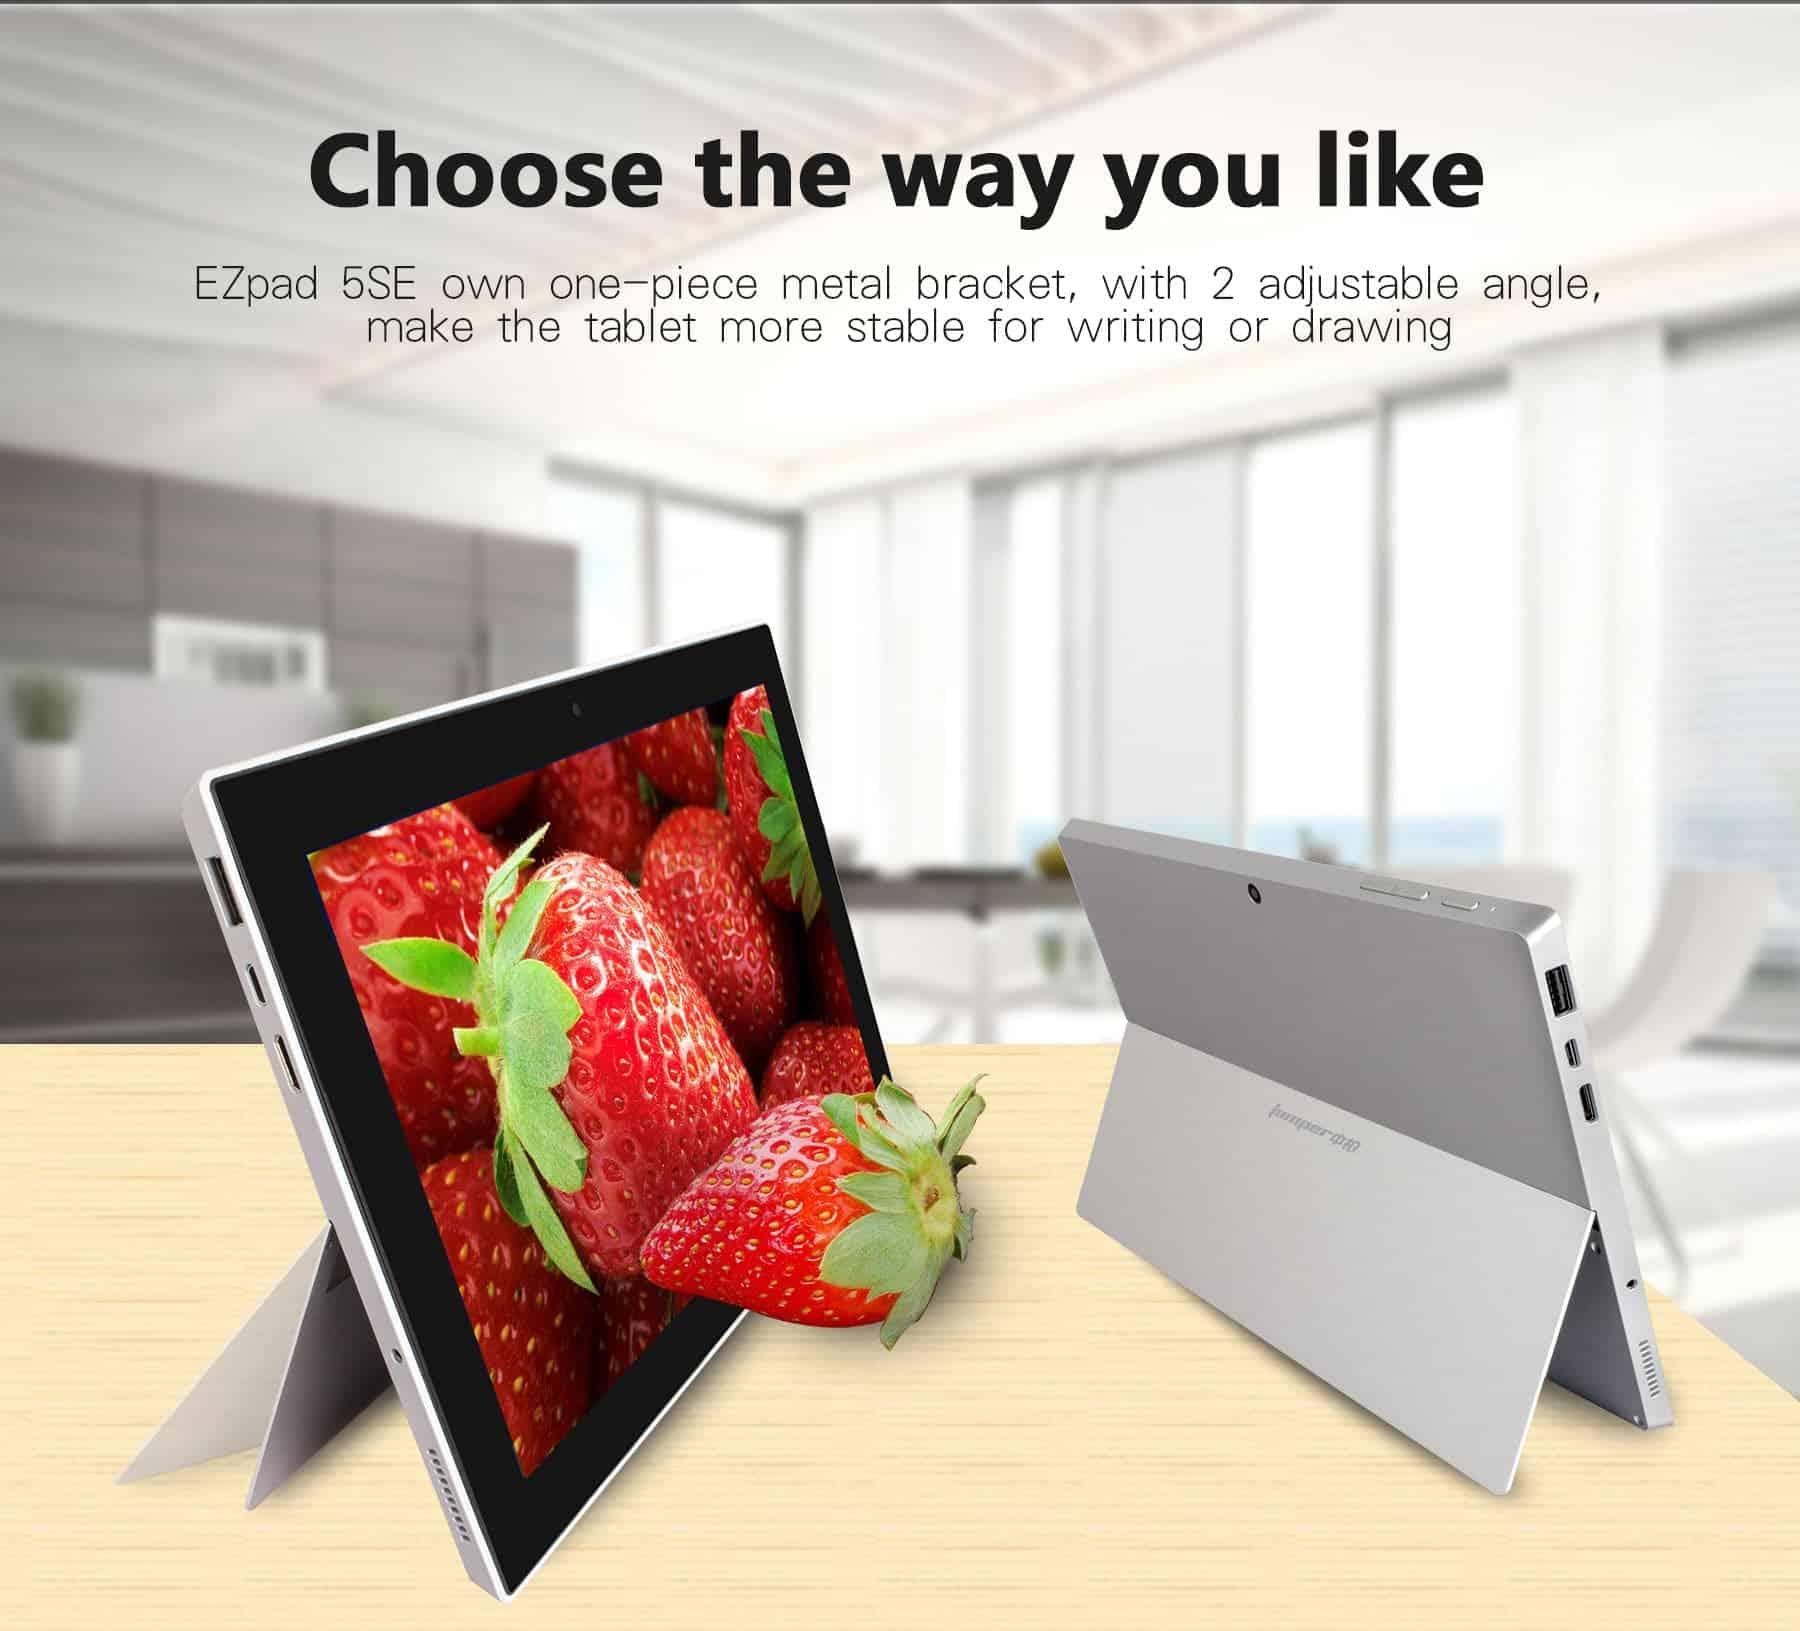 Jumper EZpad 5SE tablet